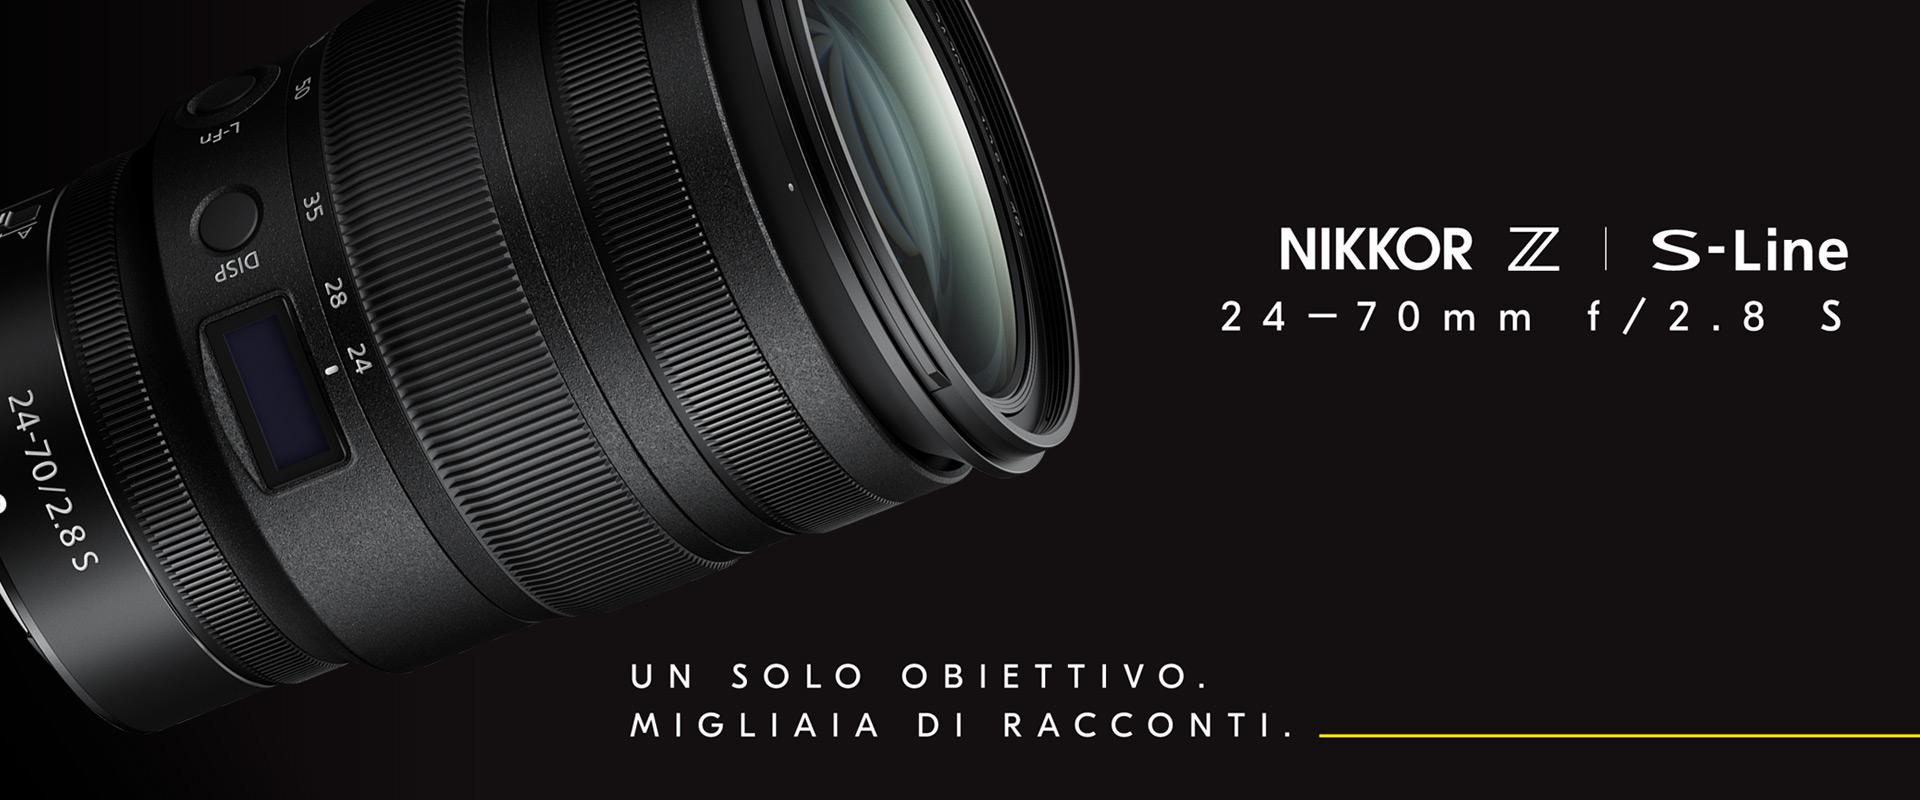 Centro Assistenza Nikon Roma.Nital It